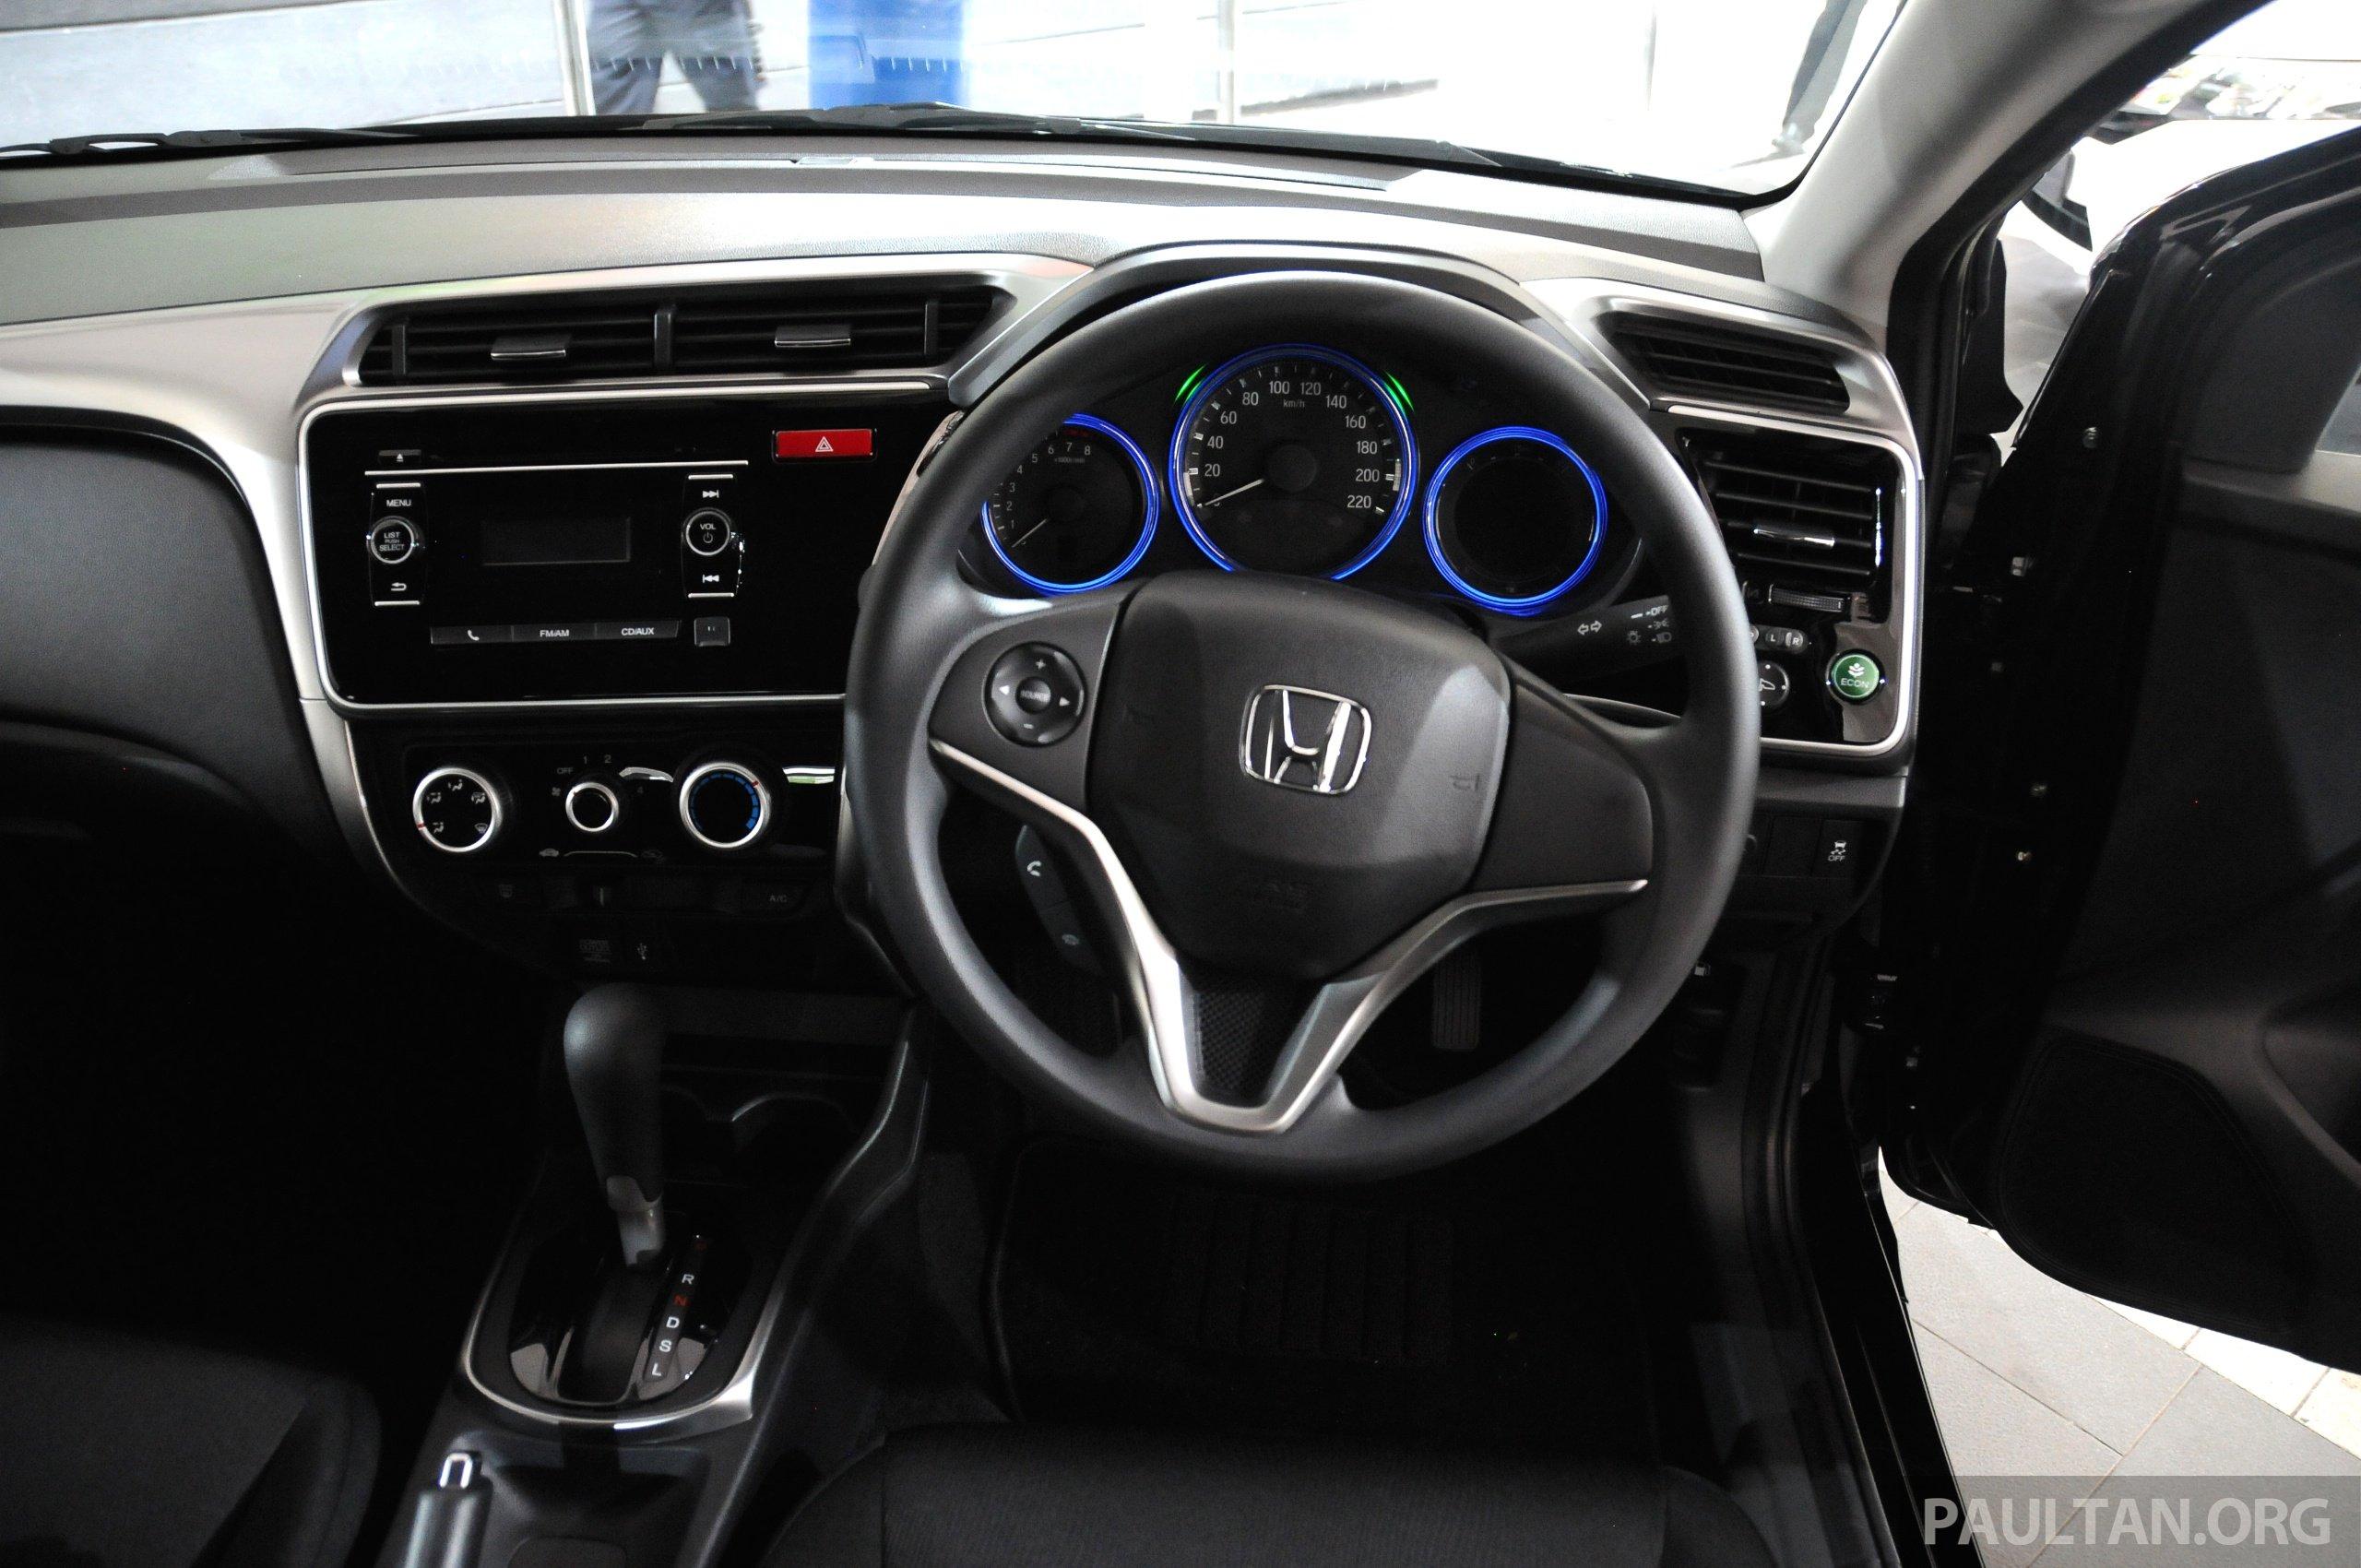 2014 Honda City E 011 Paul Tan S Automotive News